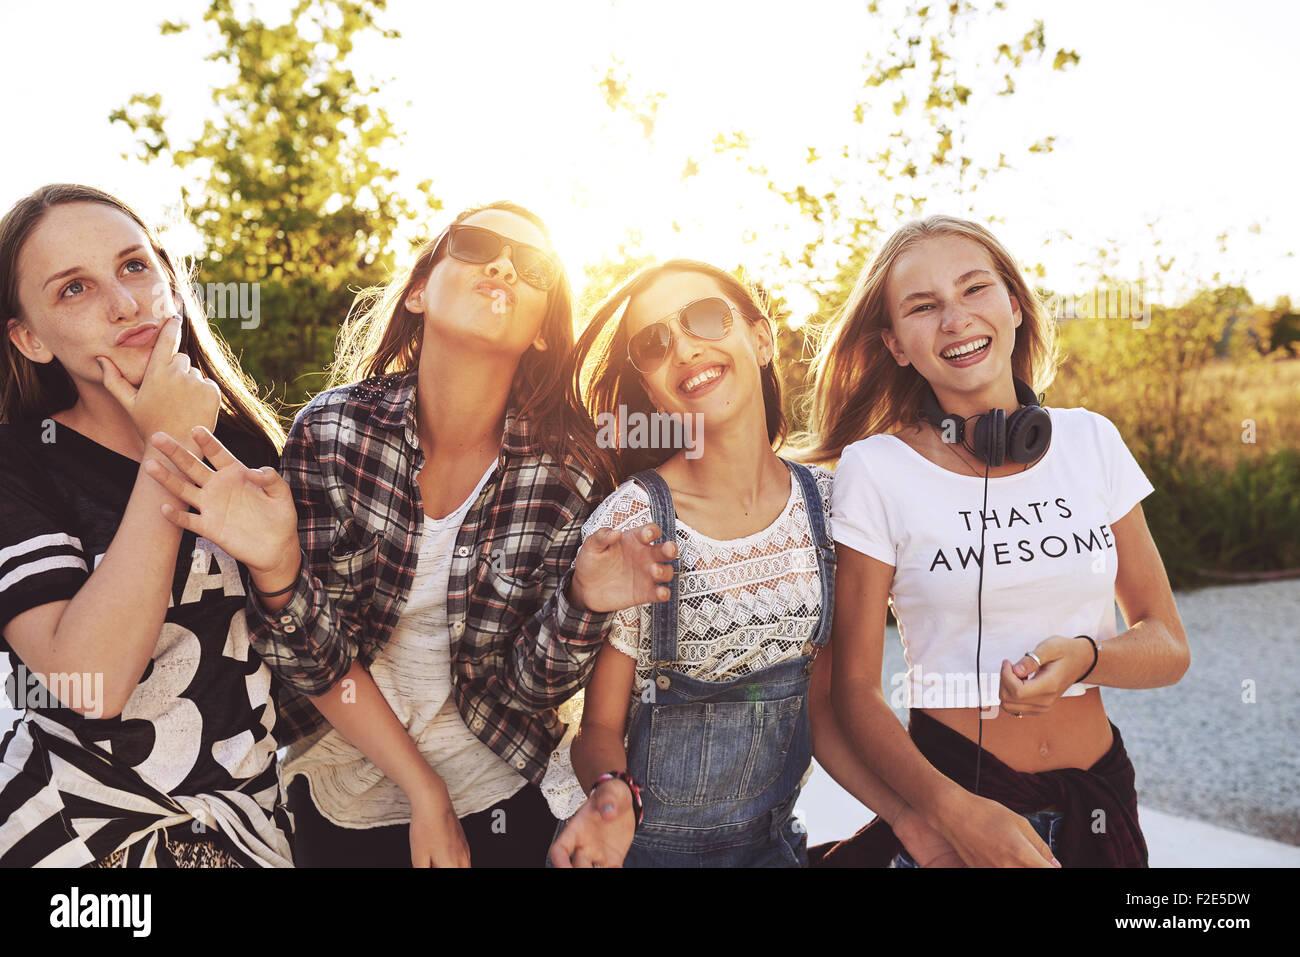 Teenagers having fun on a summer day, sun flare - Stock Image